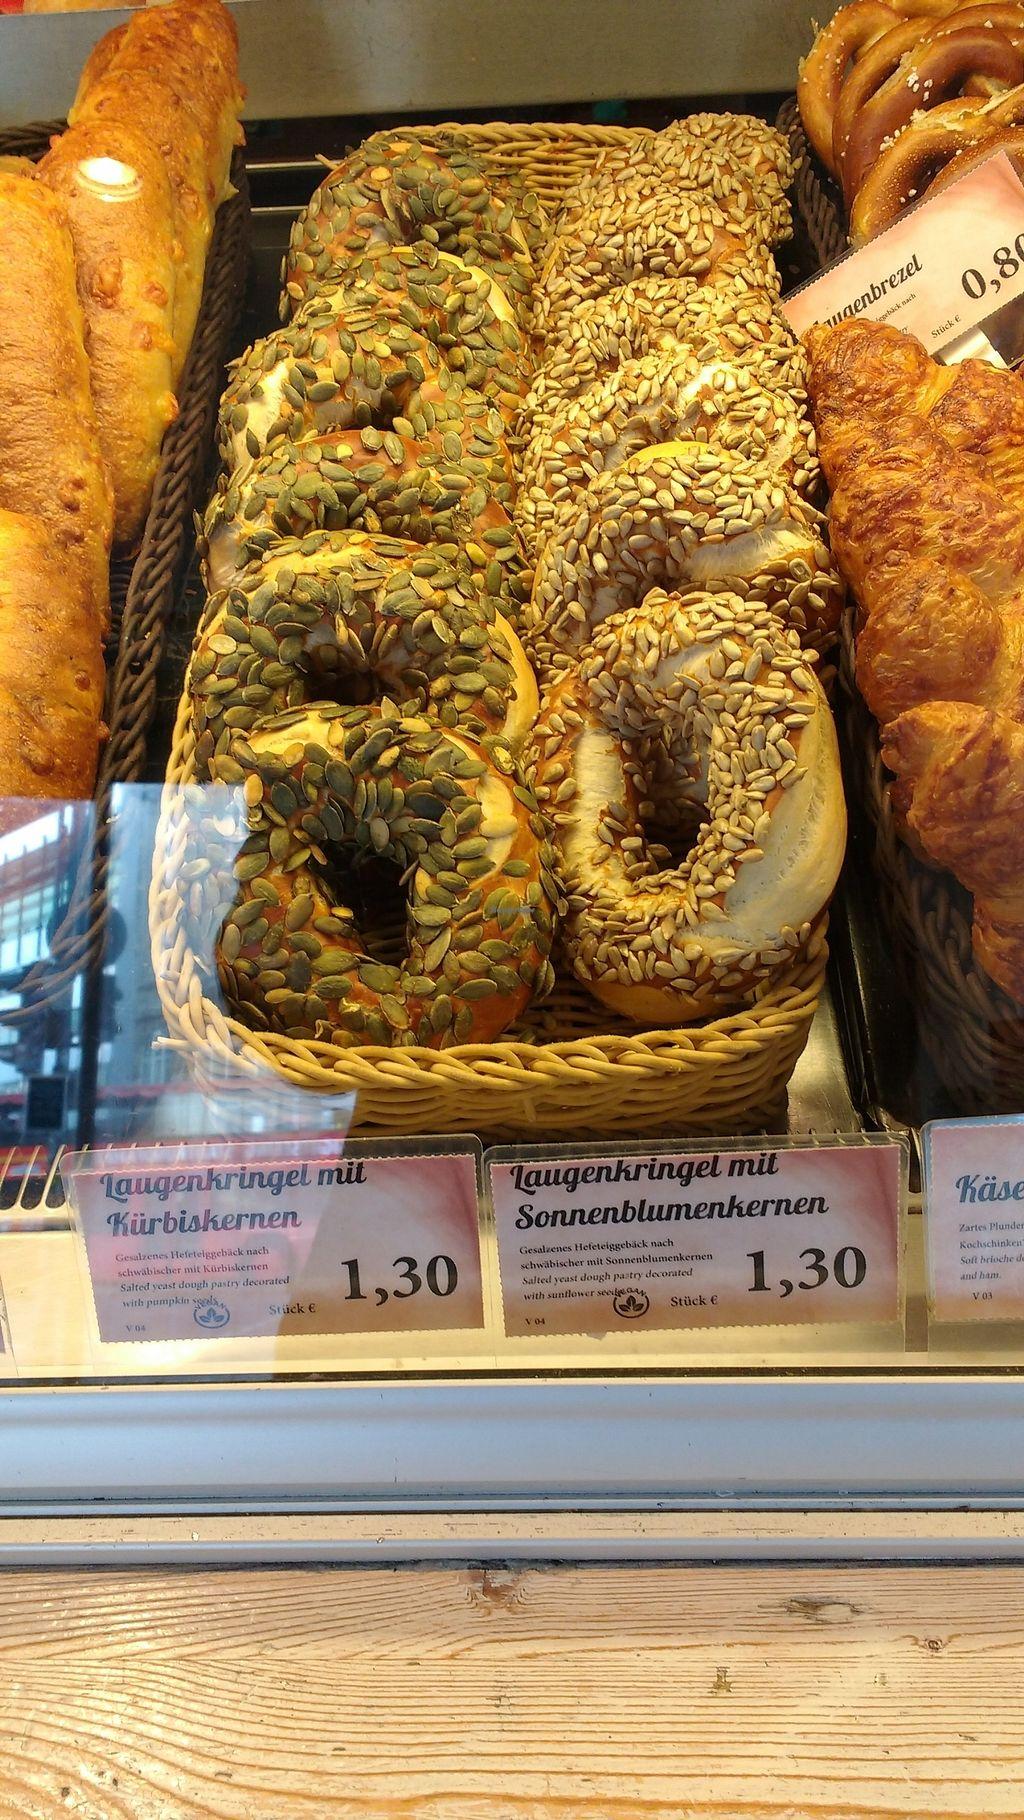 "Photo of Kamps Backstube  by <a href=""/members/profile/KirstenSchellekens"">KirstenSchellekens</a> <br/>Langenkringel (pretzel dough in bagel shape) <br/> April 10, 2018  - <a href='/contact/abuse/image/116495/383186'>Report</a>"